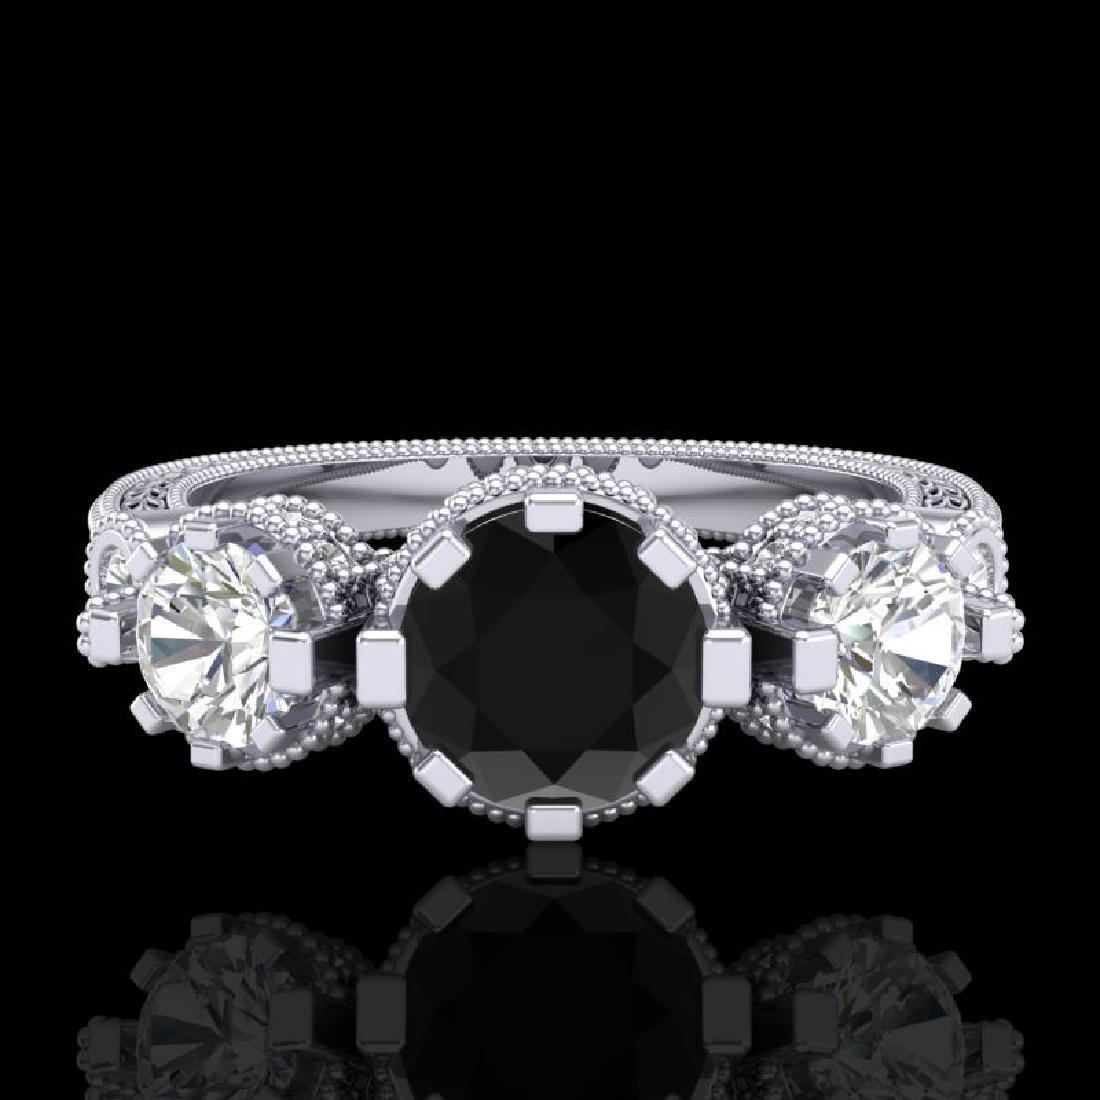 1.75 CTW Fancy Black Diamond Solitaire Art Deco 3 Stone - 2